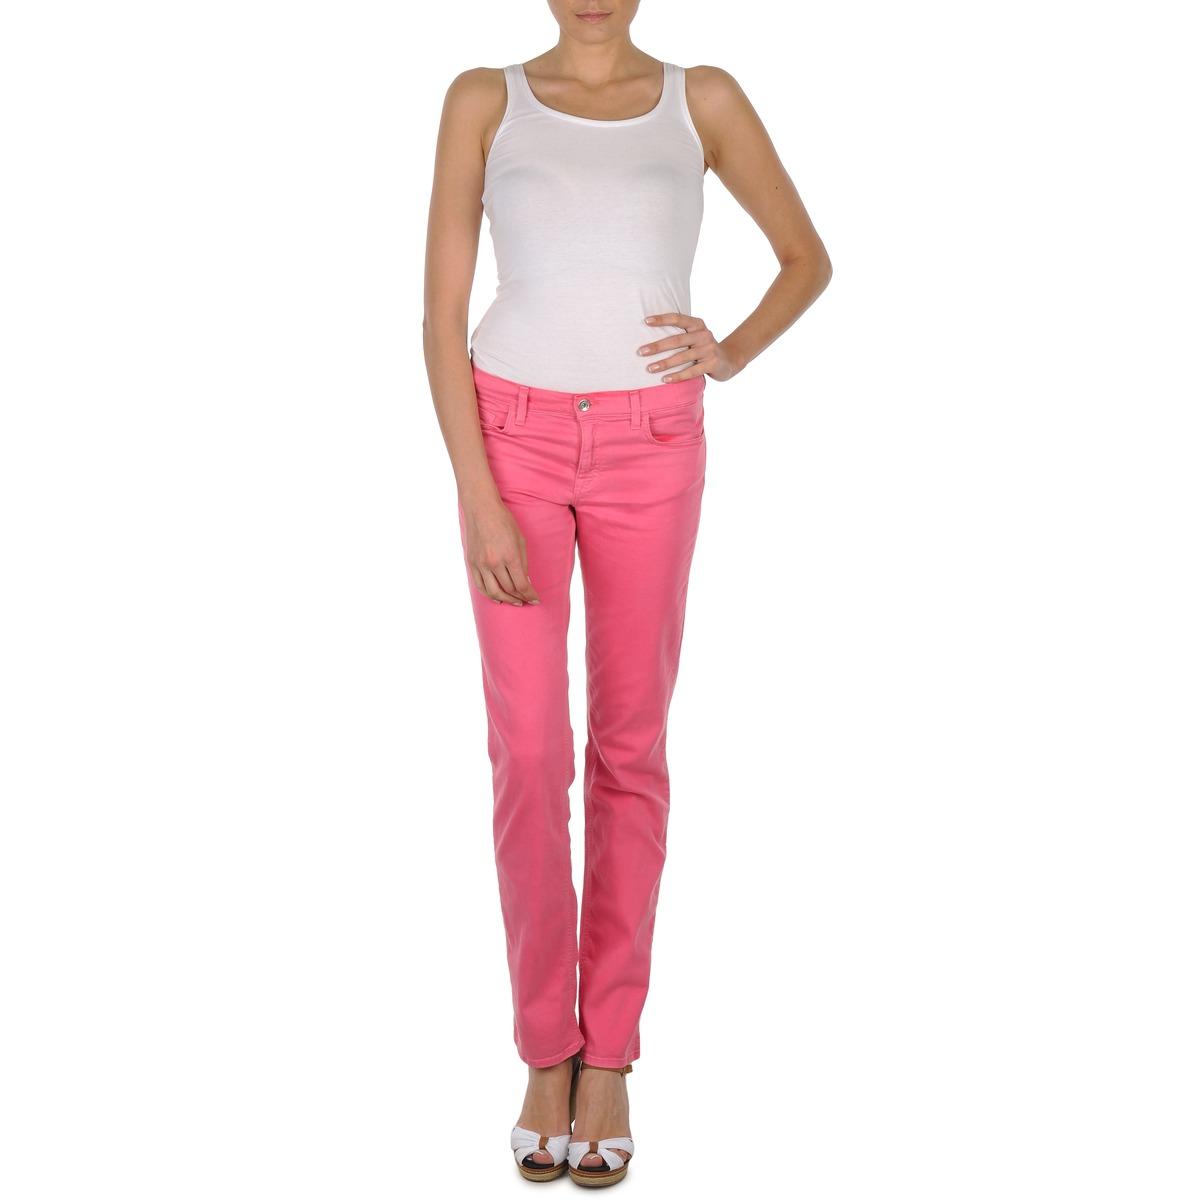 Gant DANA SPRAY COLORED DENIM PANTS Pink